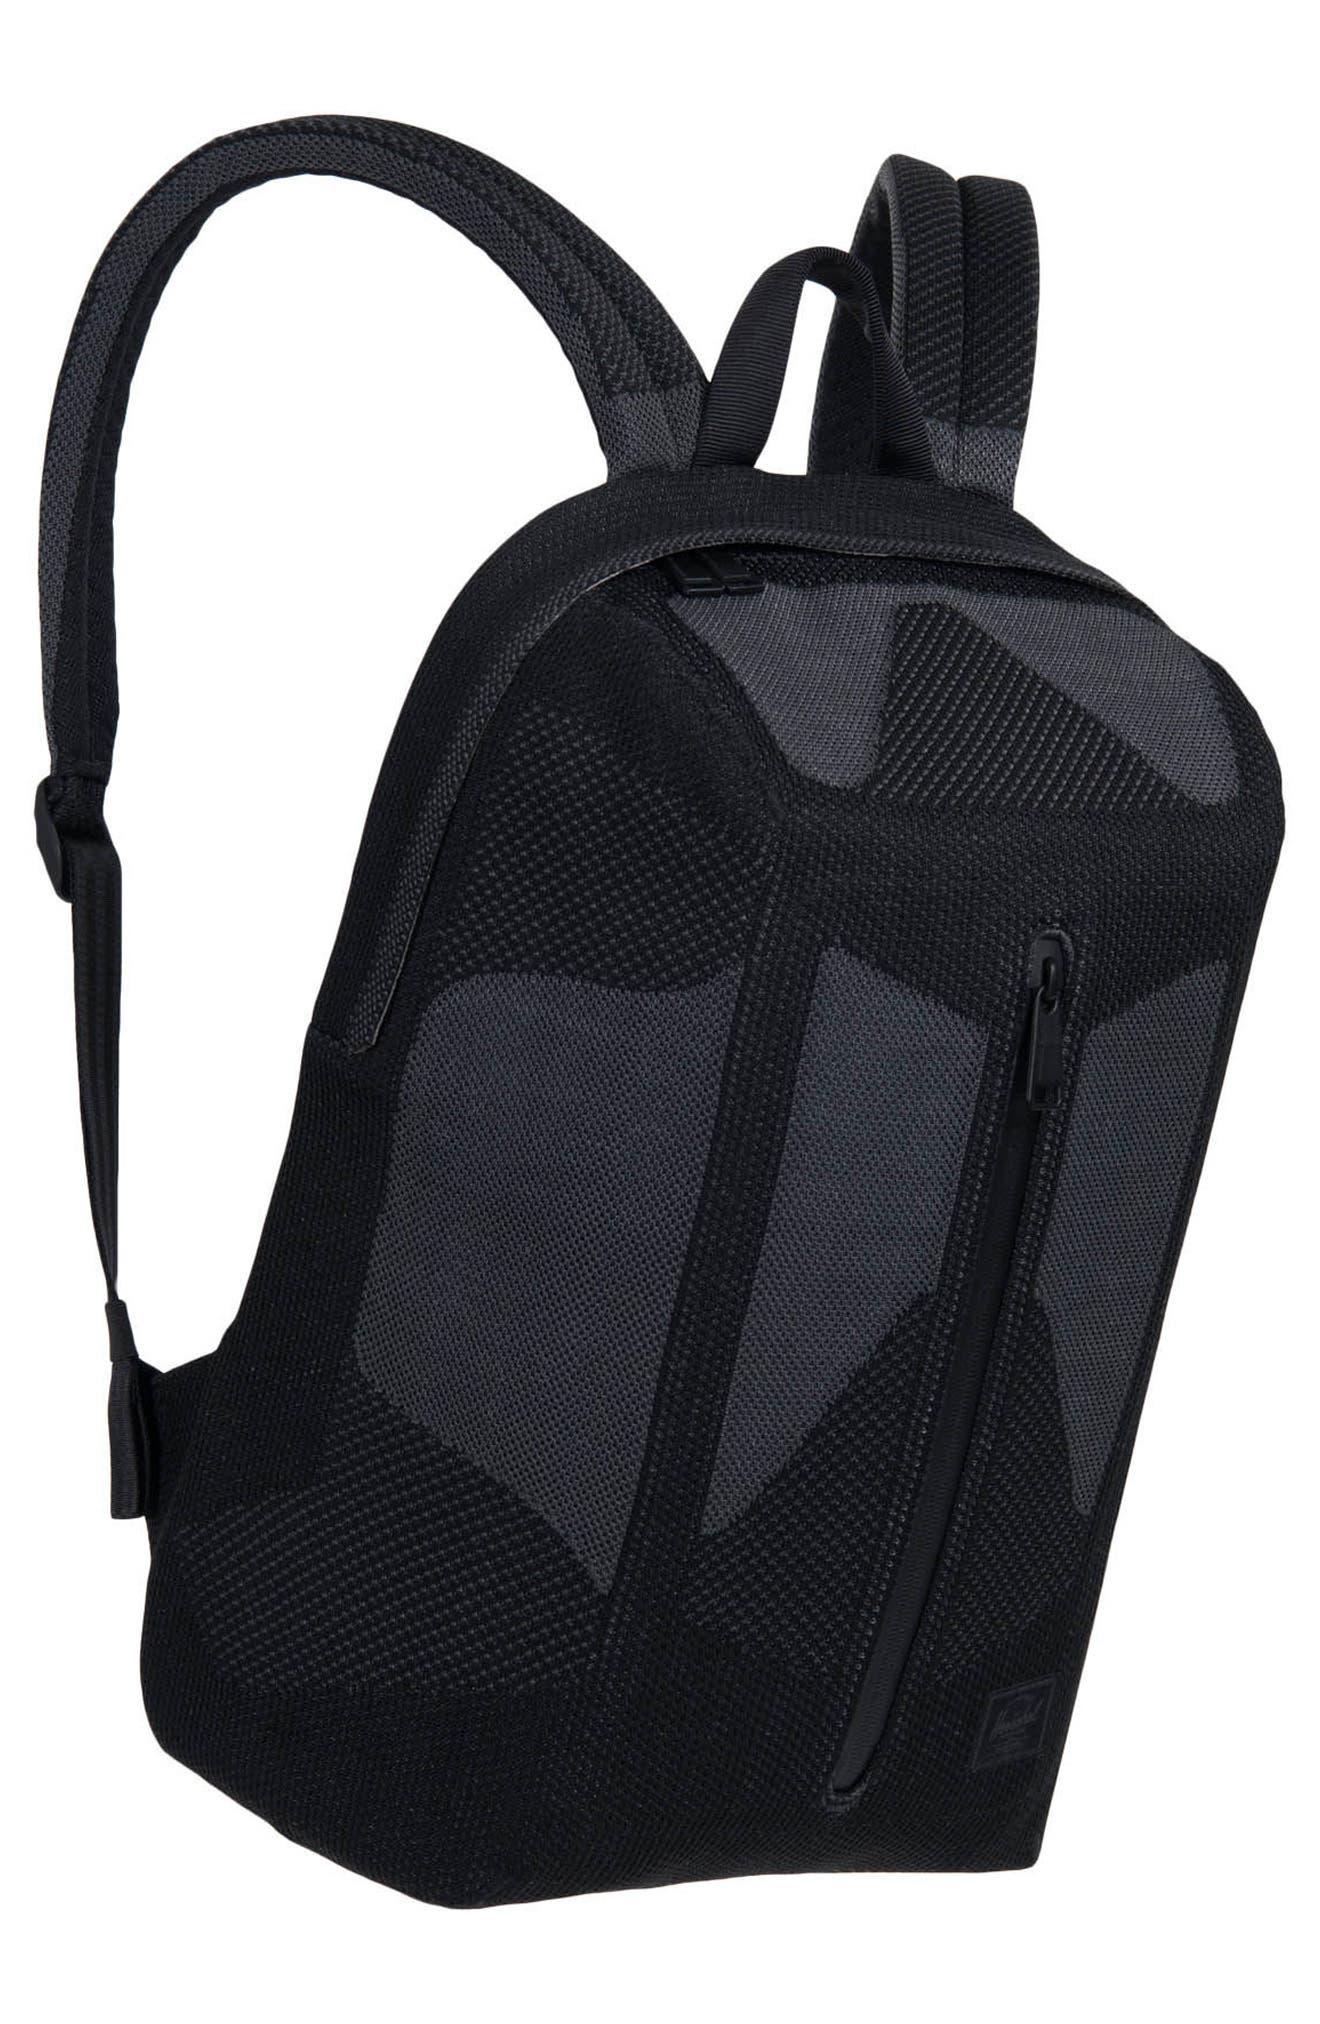 Apex Dayton Backpack,                             Alternate thumbnail 4, color,                             Black Beauty/ Dark Shadow